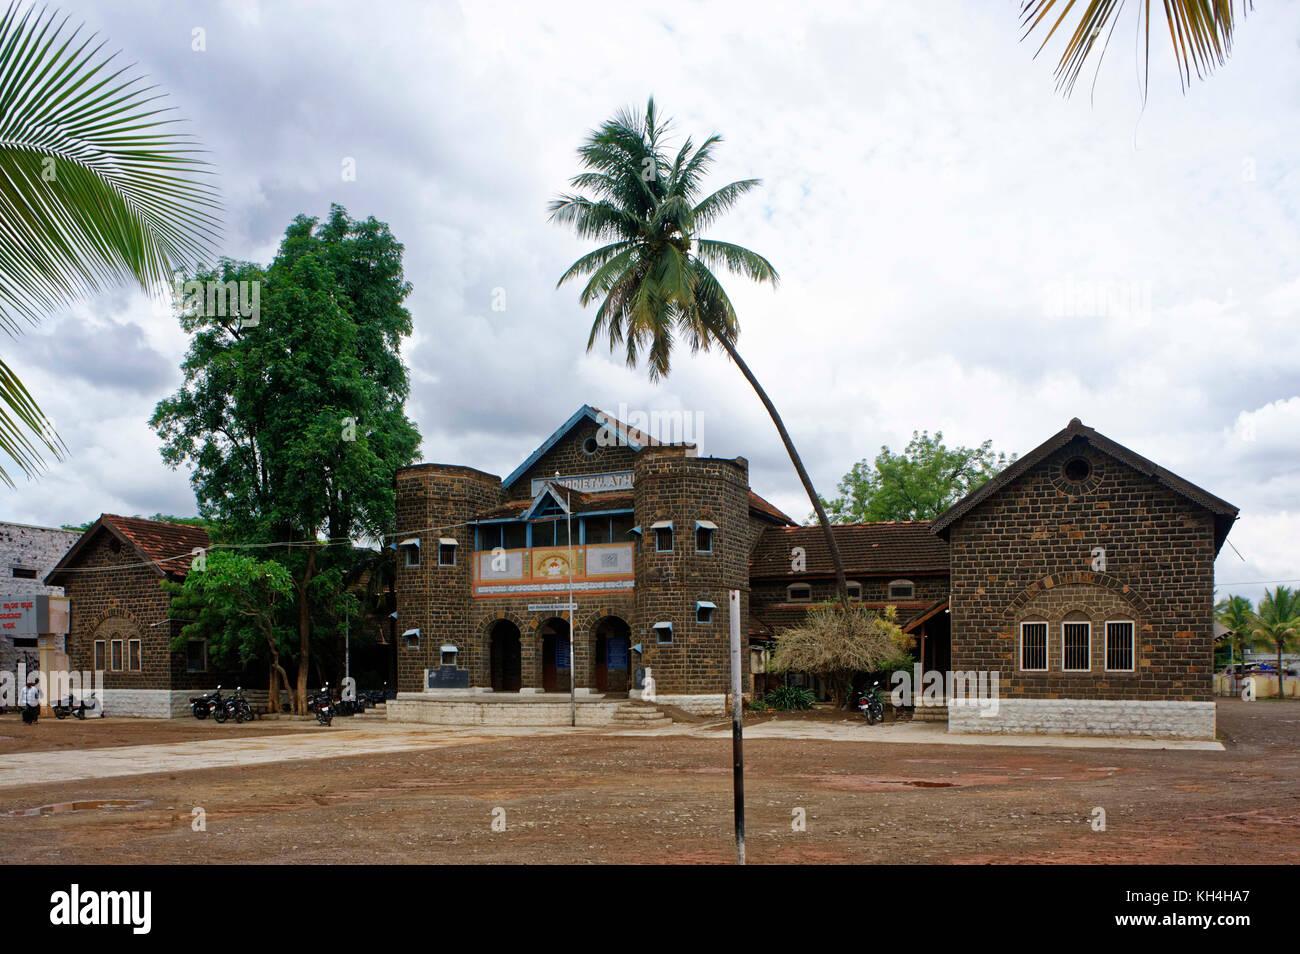 J s gesellschaft Schulgebäude, belagavi, Karnataka, Indien, Asien Stockbild